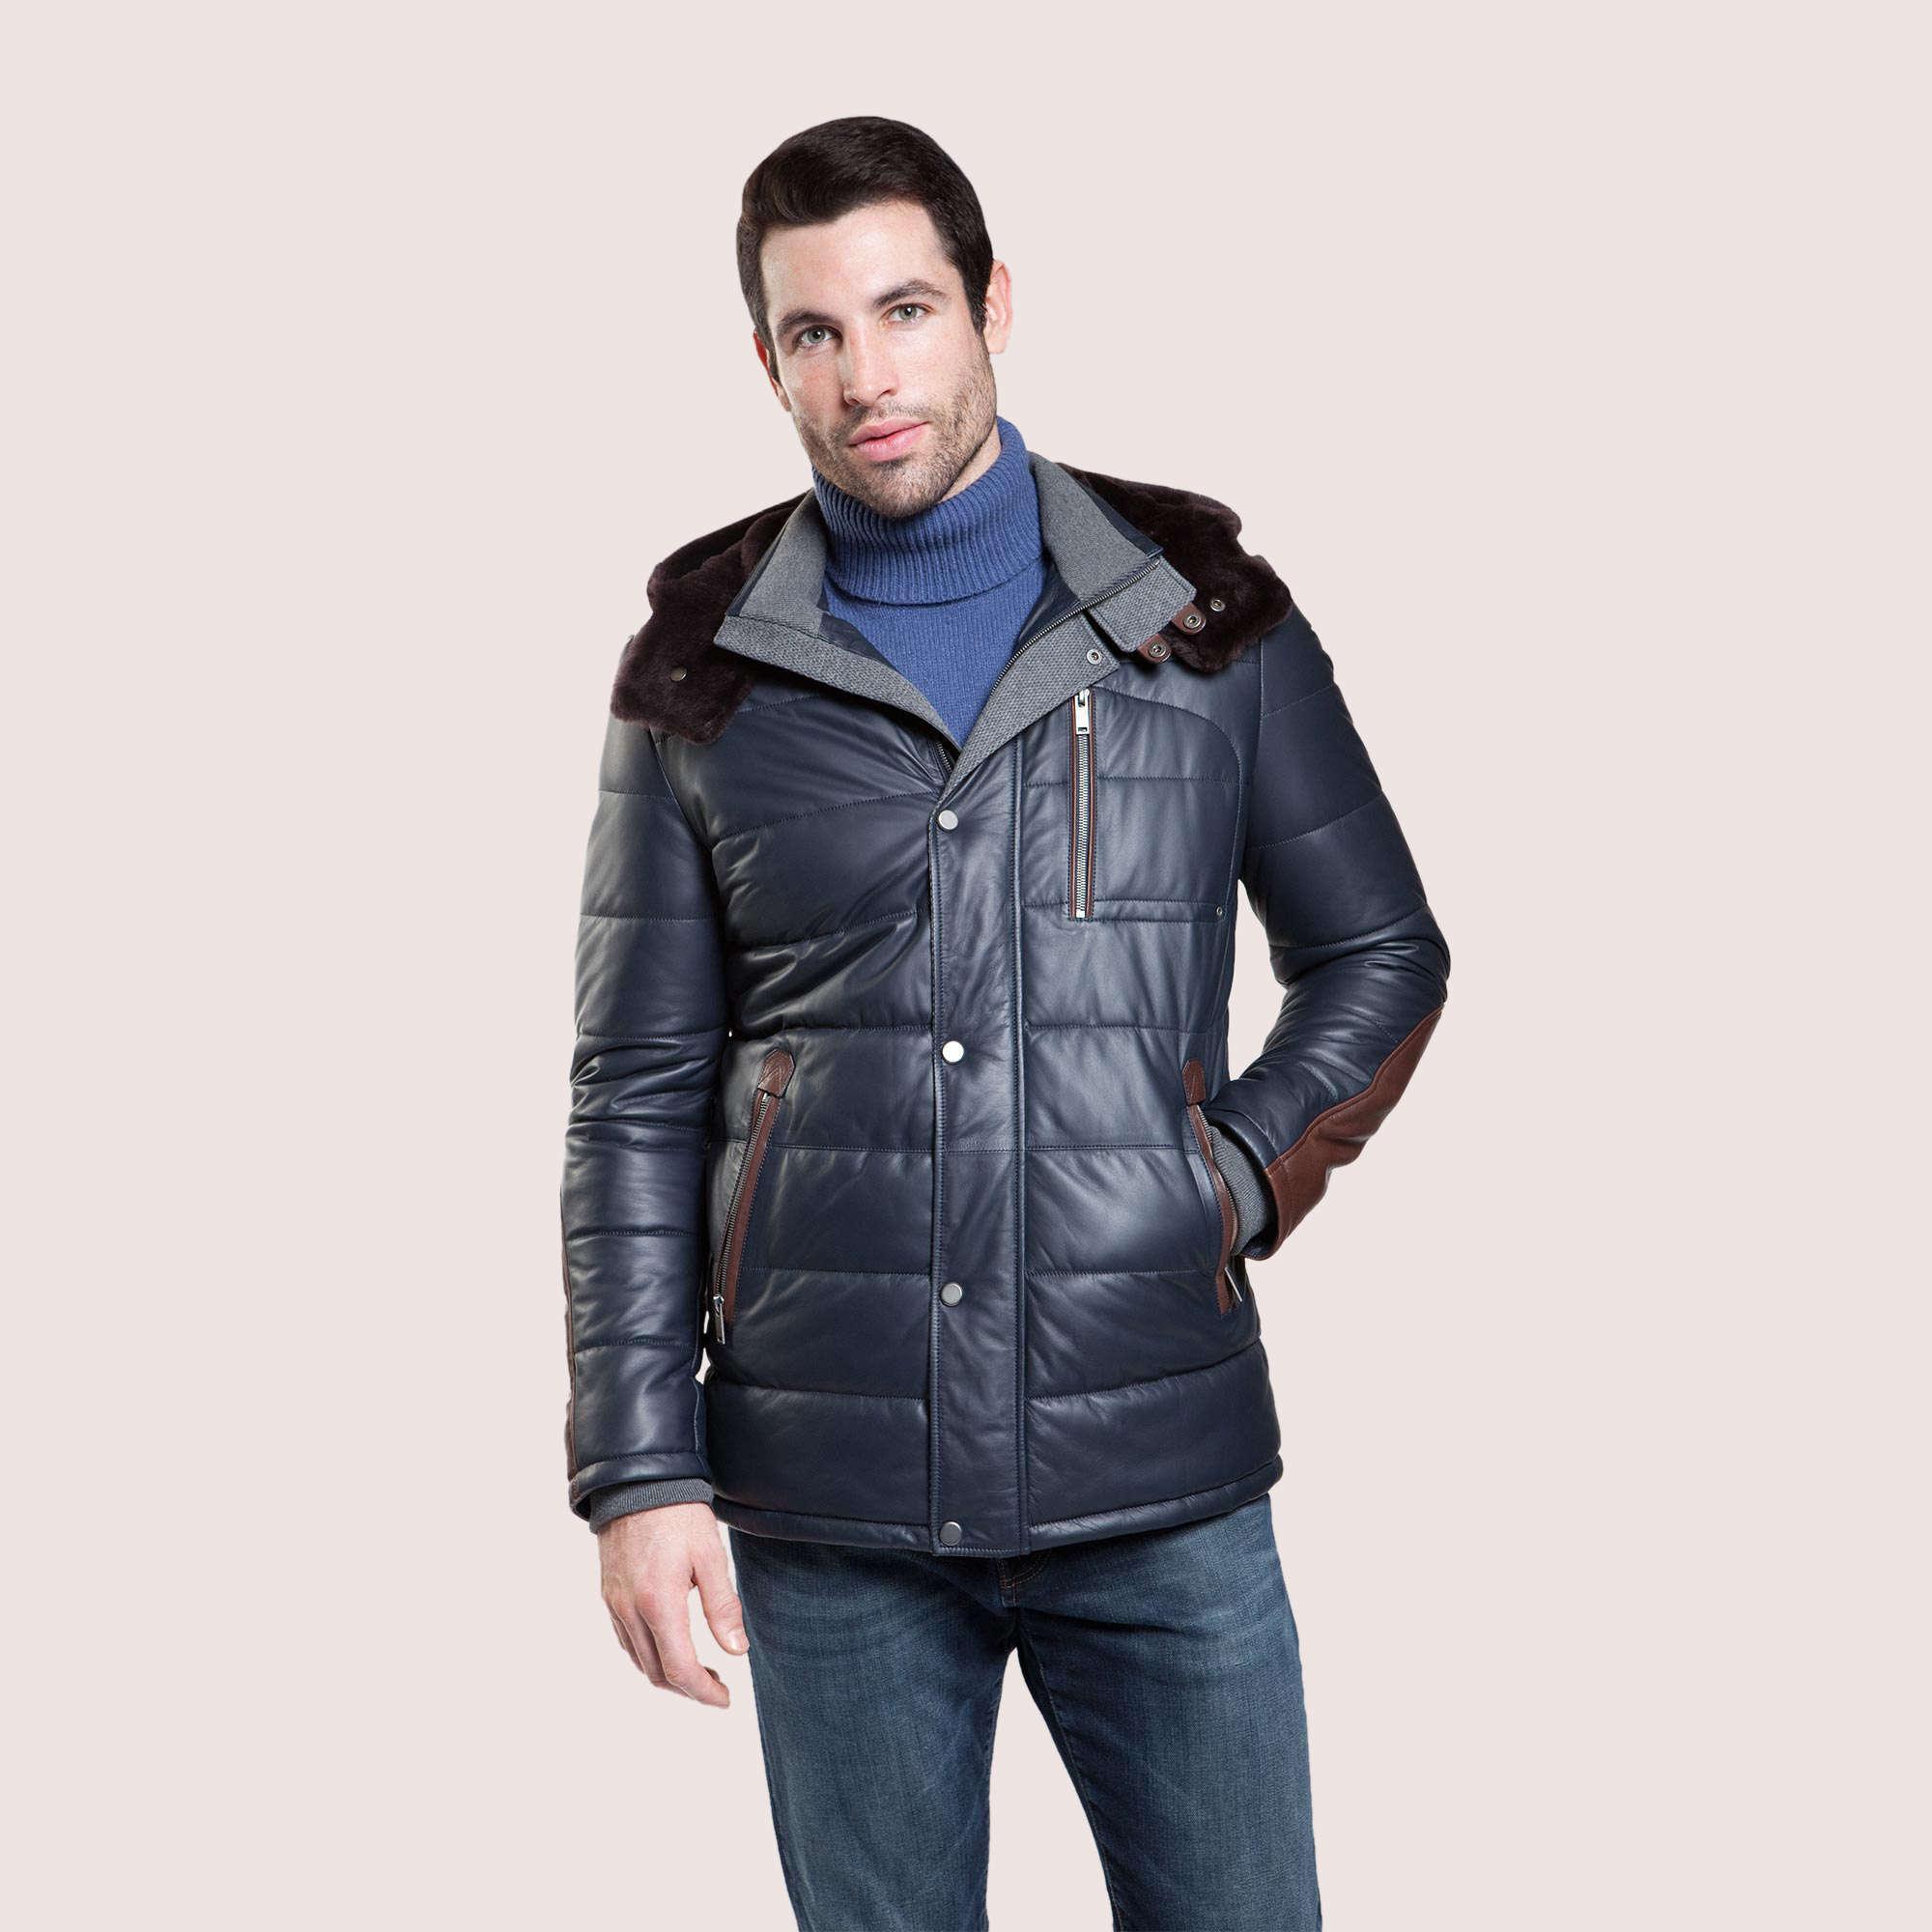 Aspen Leather Jacket